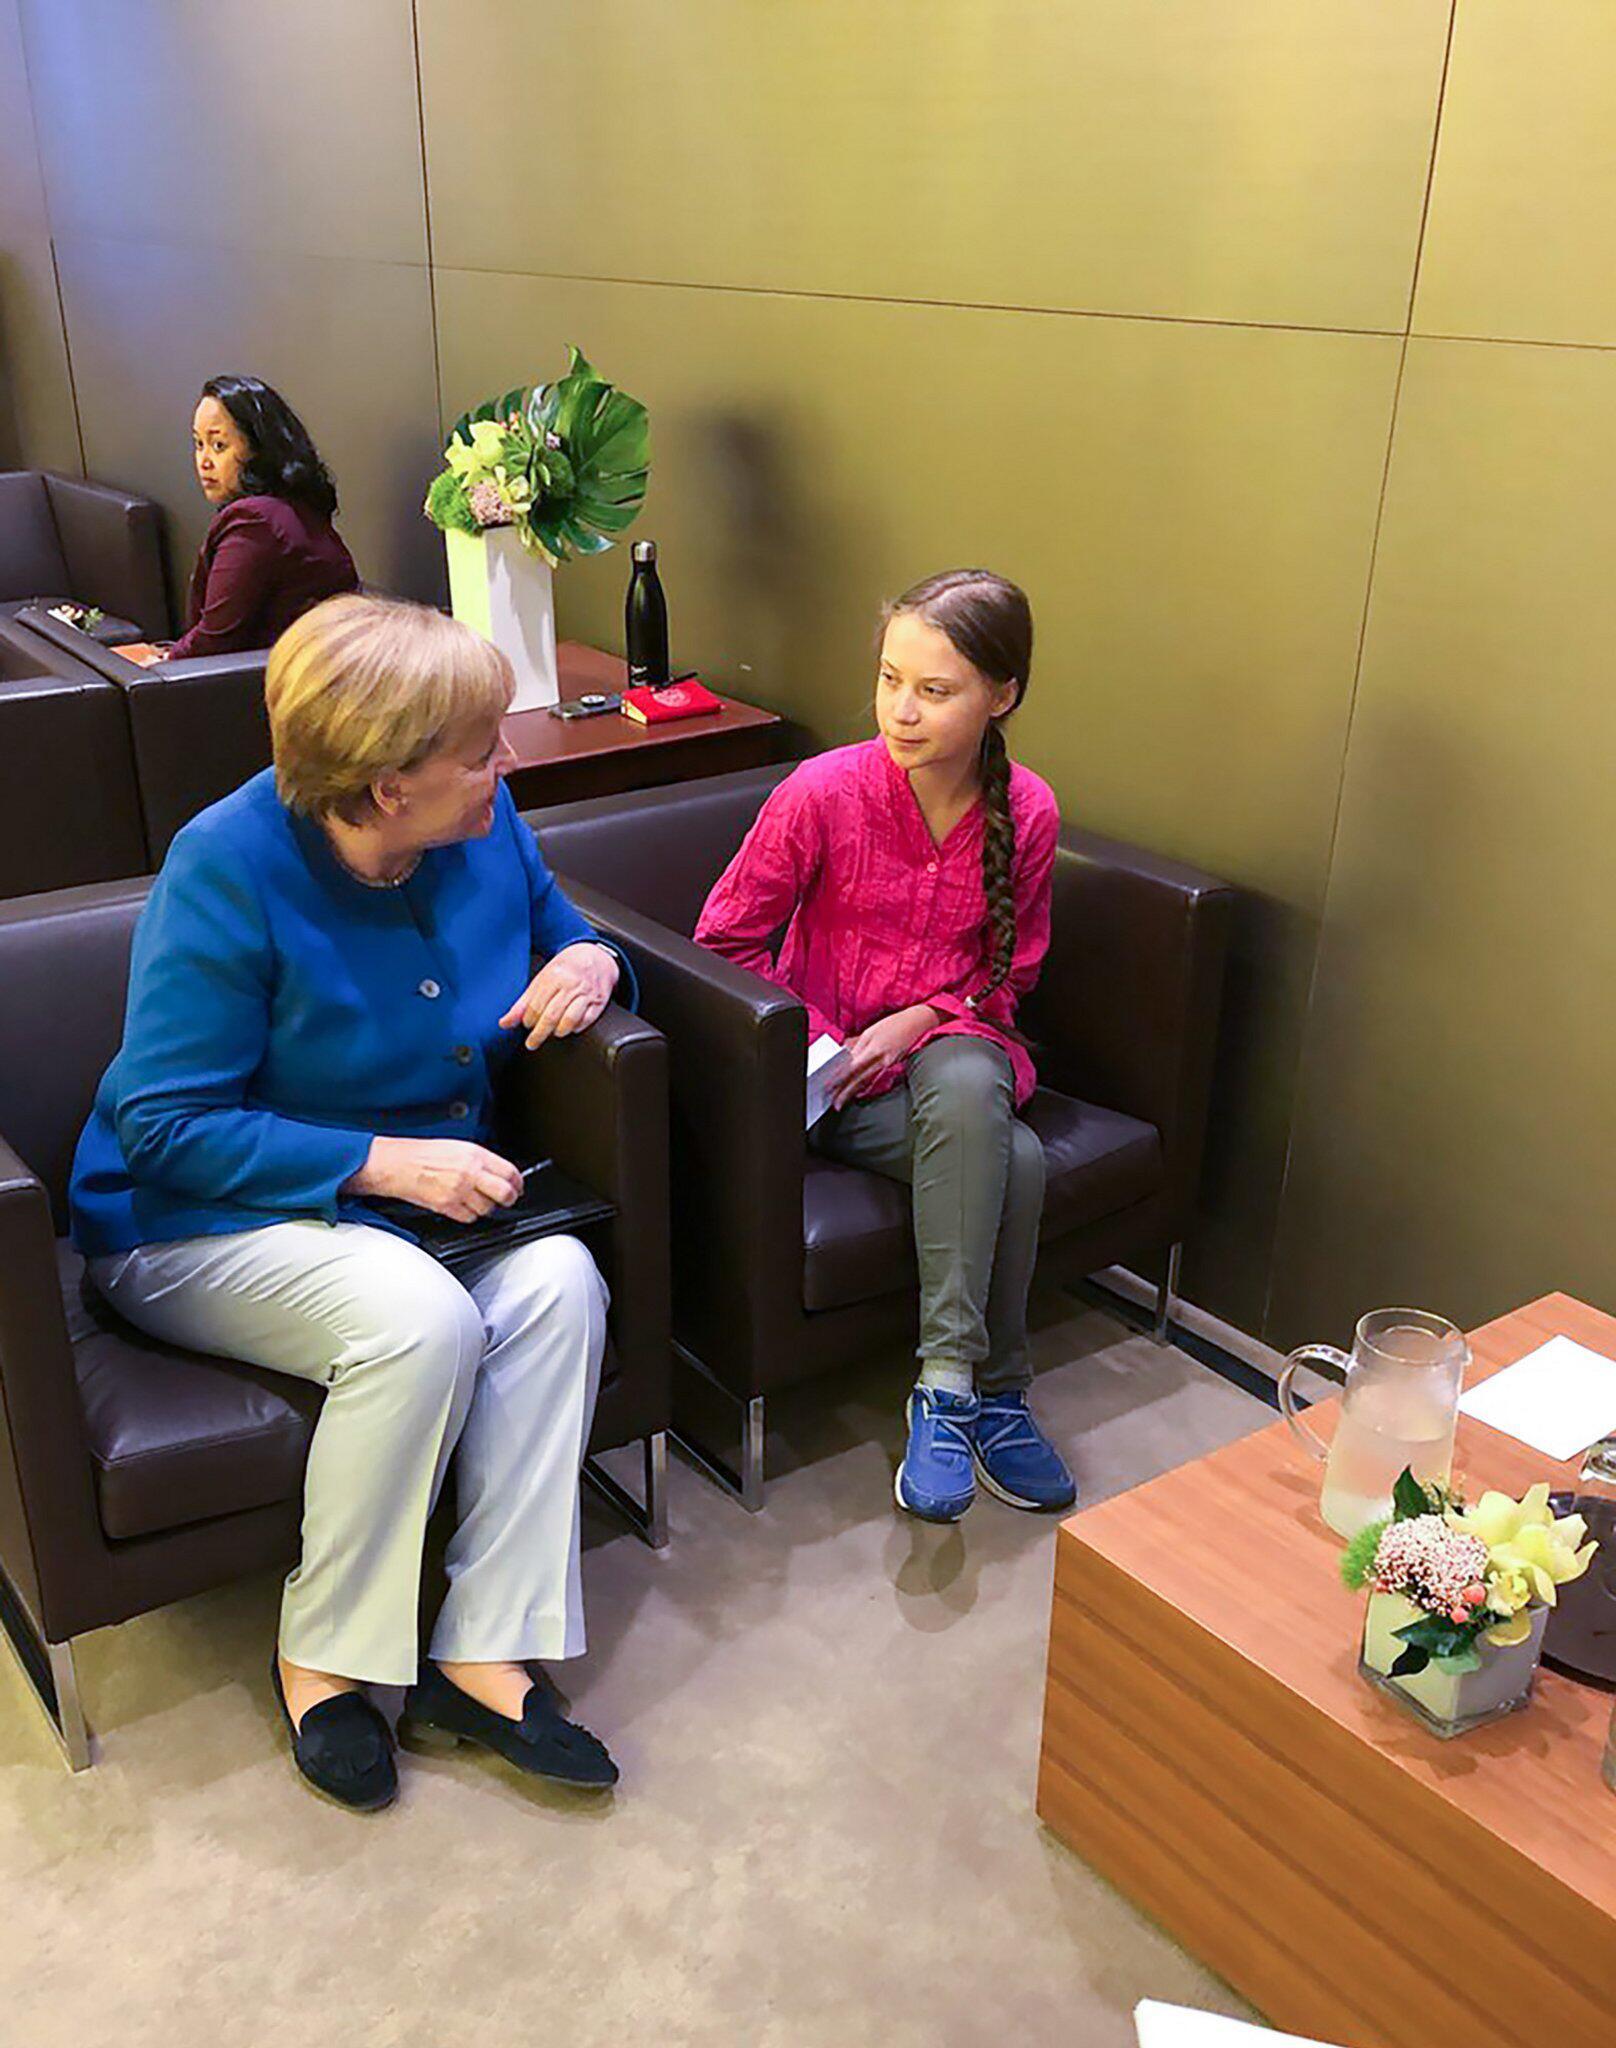 Bild zu Angela Merkel, Greta Thunberg